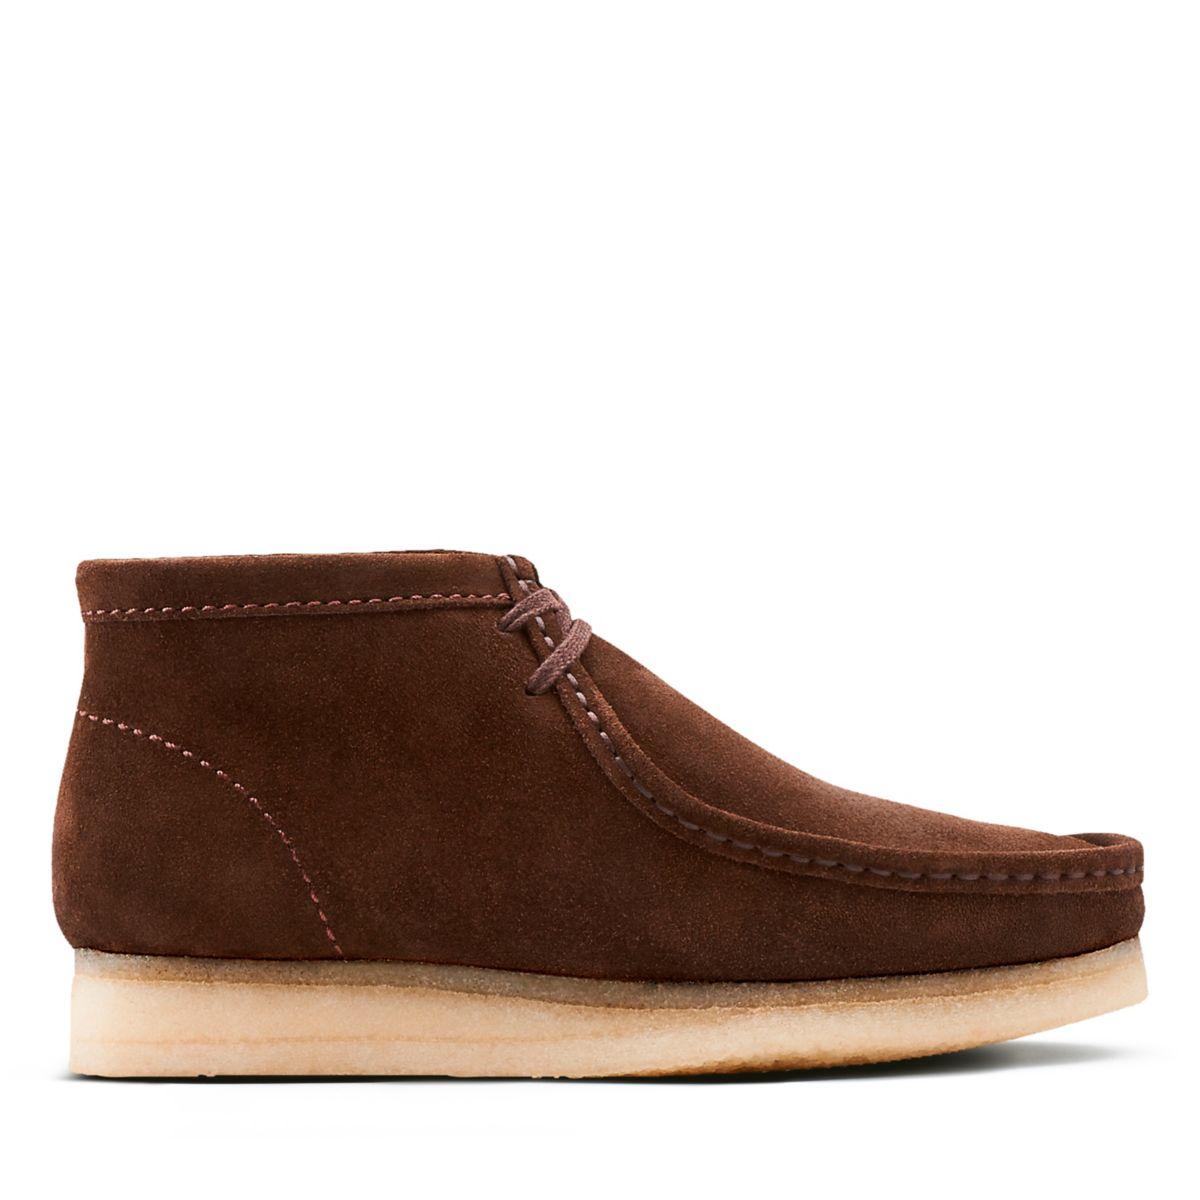 Wallabee Boot Brown Suede Clarks Originals Mens Boots